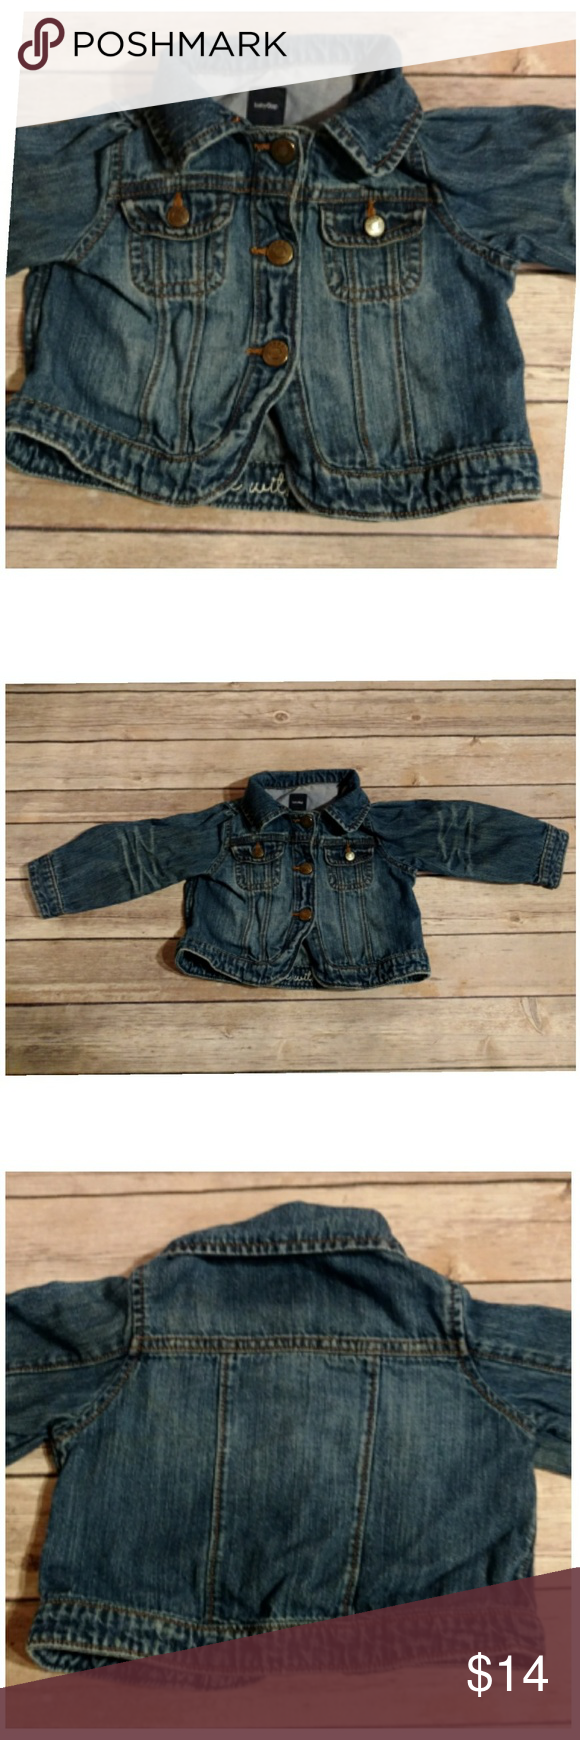 fd1a94e87125 12-18M Baby Gap Jean Jacket Size  12 - 18 months Brand  Baby Gap ...